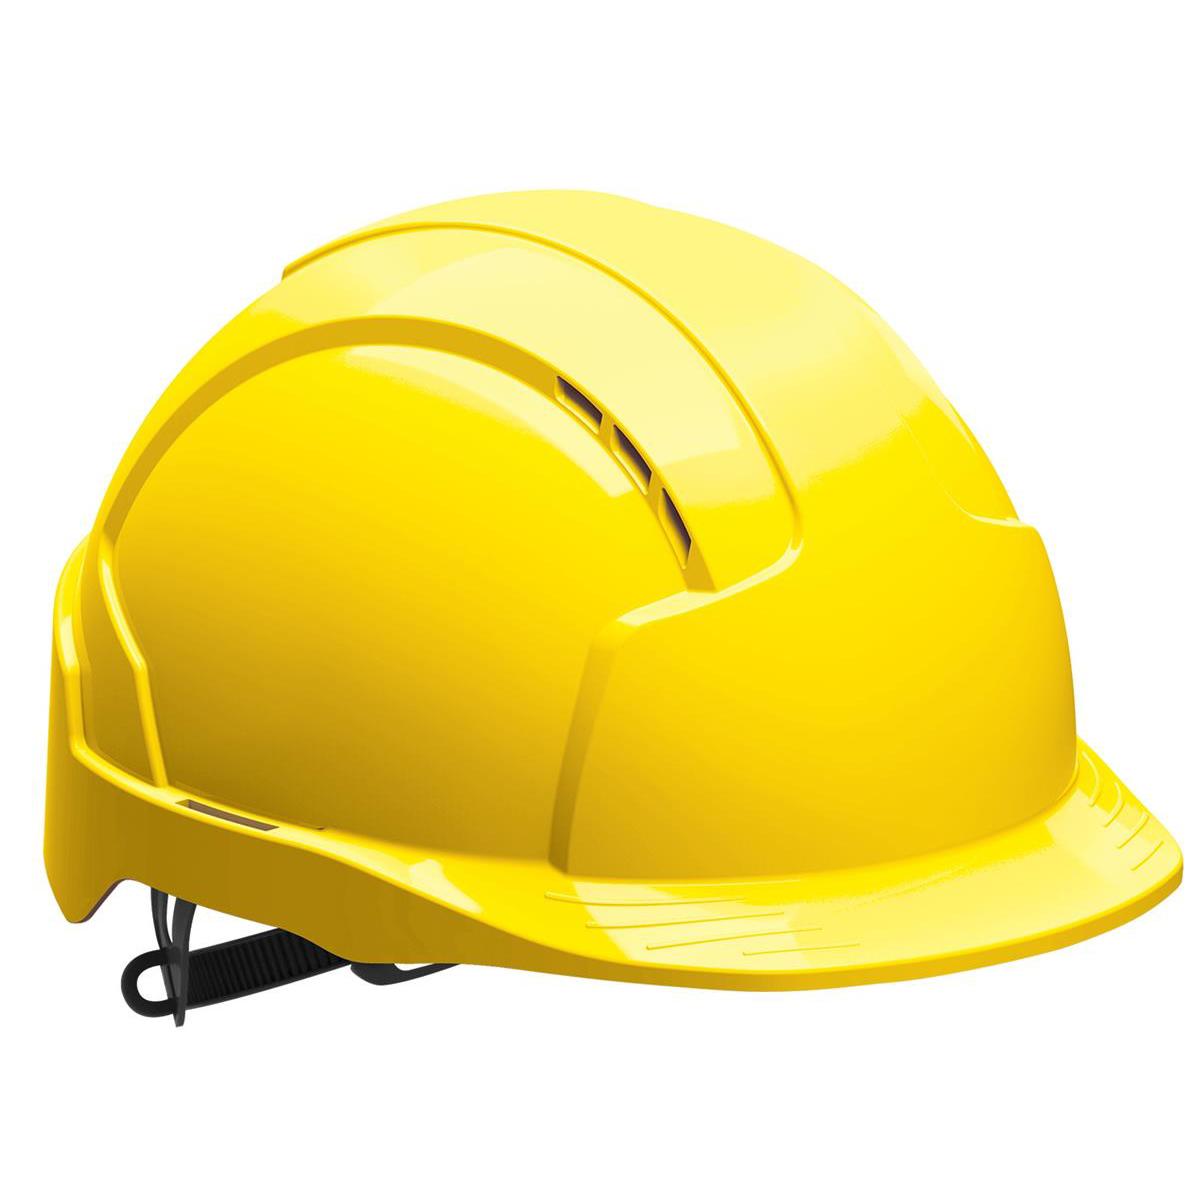 Head Protection JSP EVOLite Safety Helmet ABS 6-point Terylene Harness EN397 Standard Yellow Ref AJB160-000-200